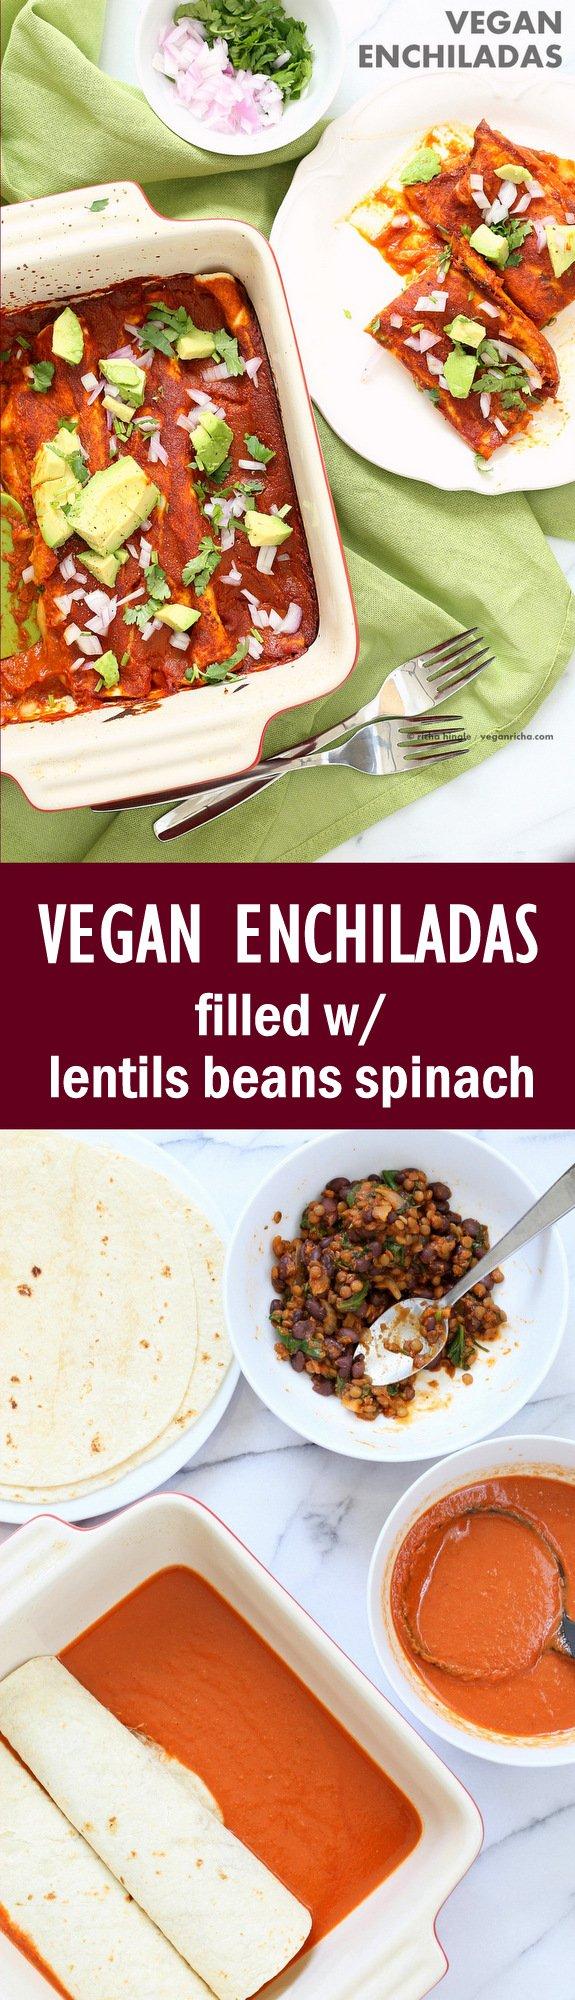 Vegan Enchiladas Recipe. Easy Enchilada Recipe with Blender Enchilada Sauce, soft tortillas filled with Black beans and Lentils. #Vegan #Soyfree Recipe. Can be #Glutenfree. Ready within One Hour | VeganRicha.com